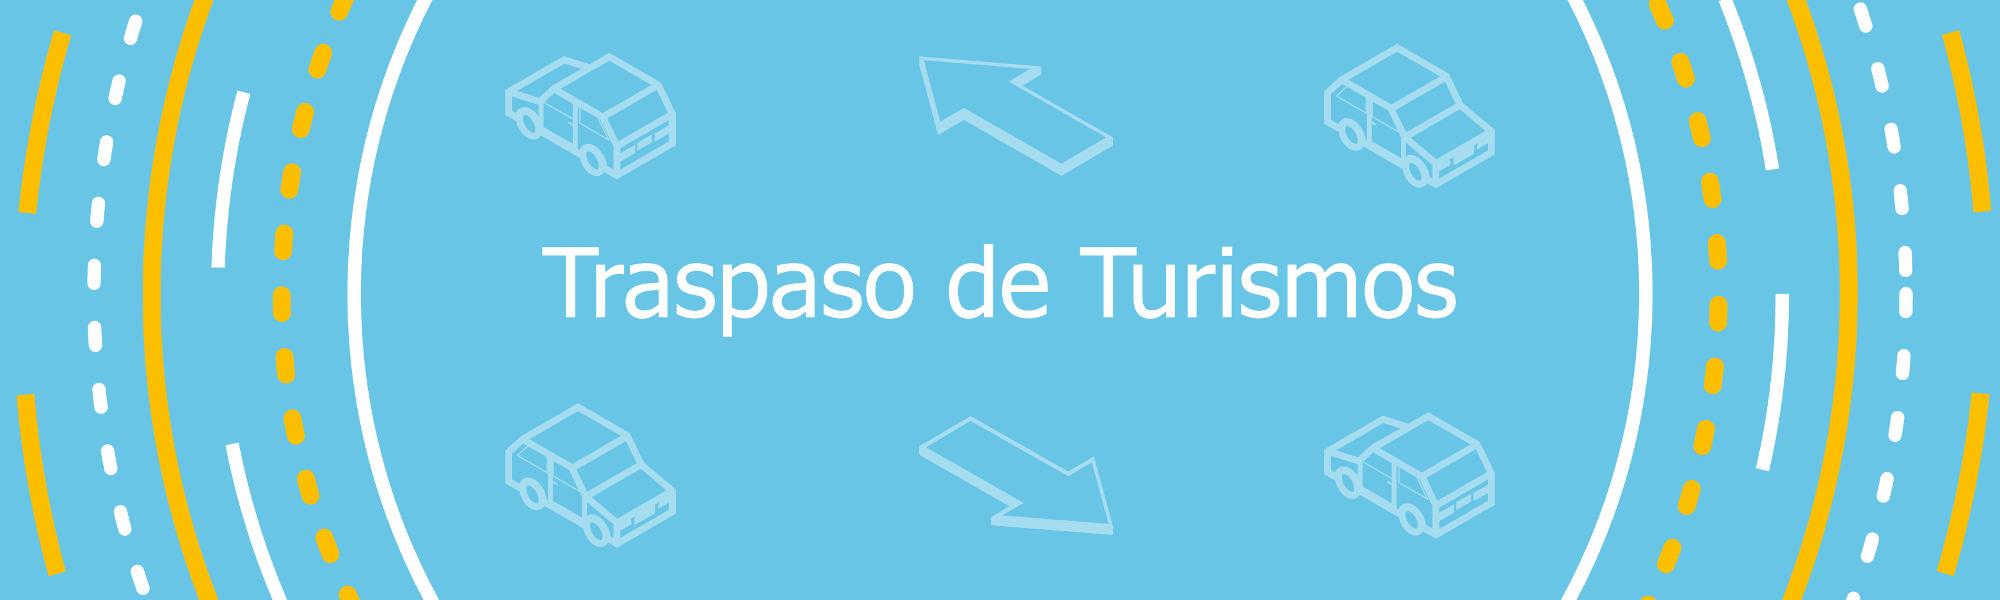 Traspaso de turismos en Tenerife